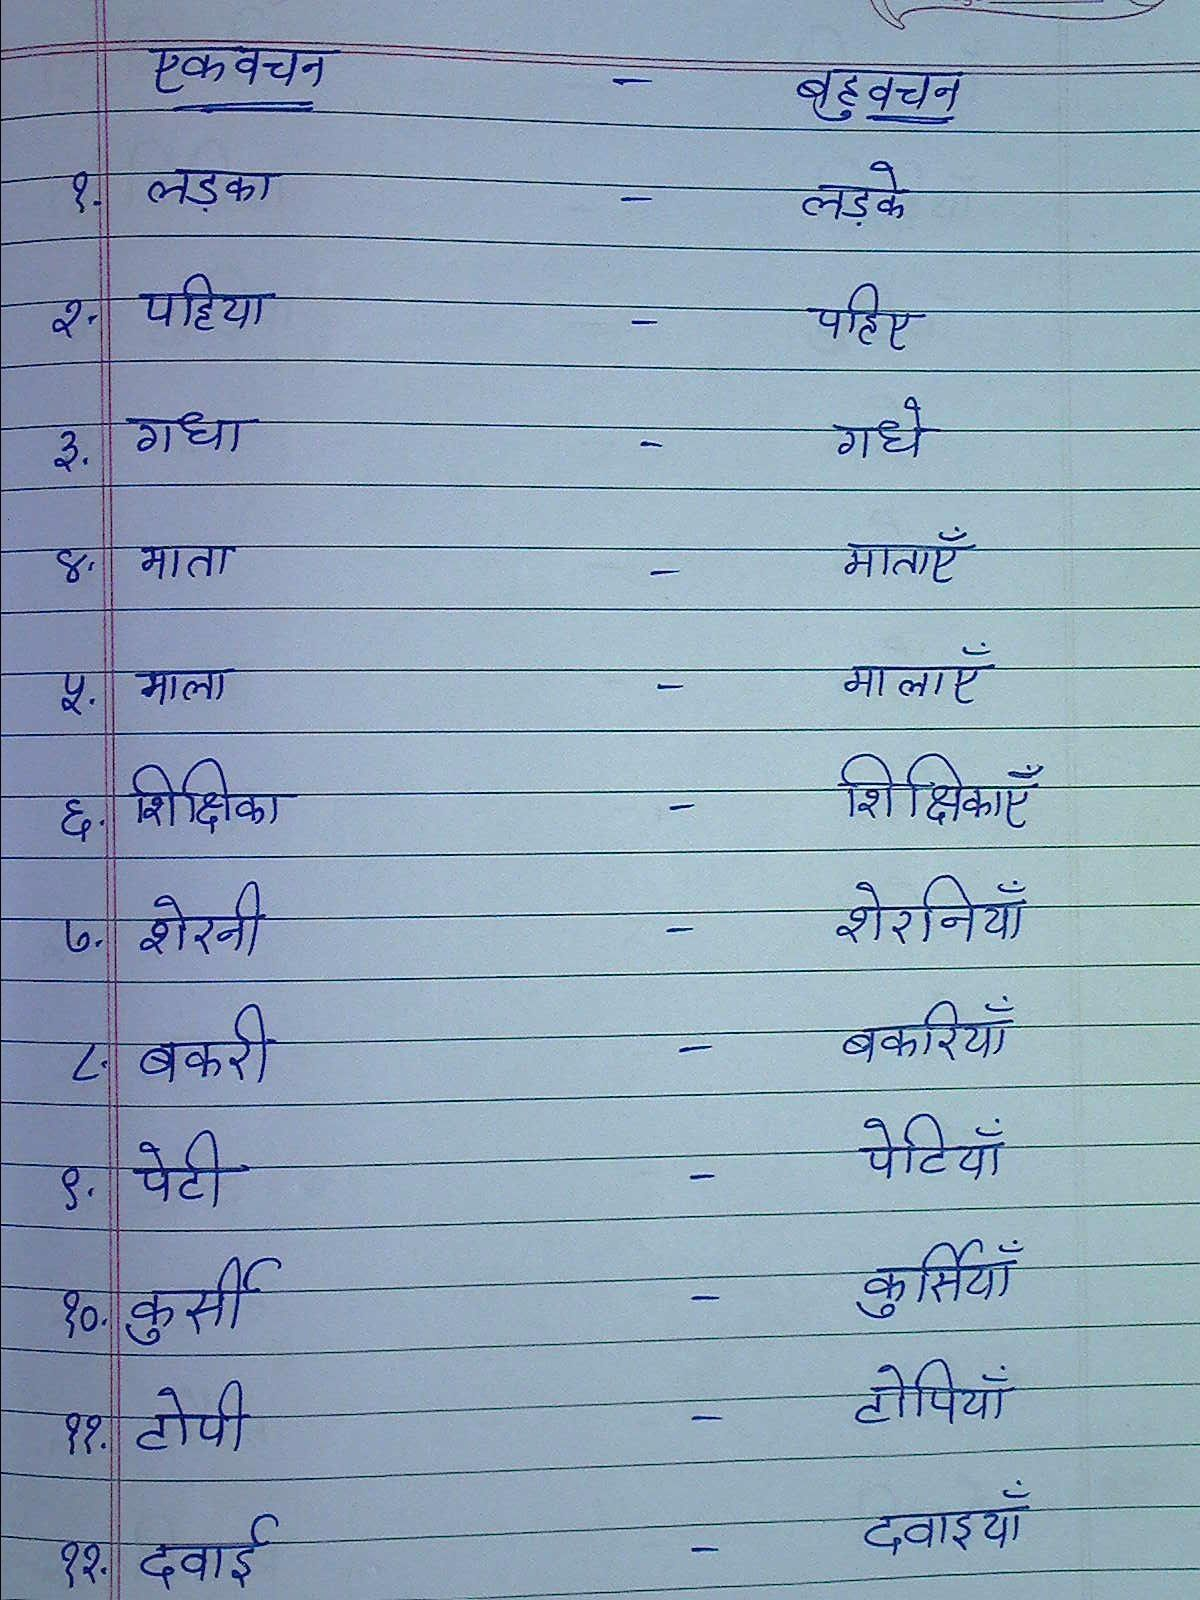 hight resolution of Numbers Worksheet In Hindi Fresh Hindi Grammar Kriya Worksheets For Class 2  numbers worksheet in hind…   Worksheet for class 2